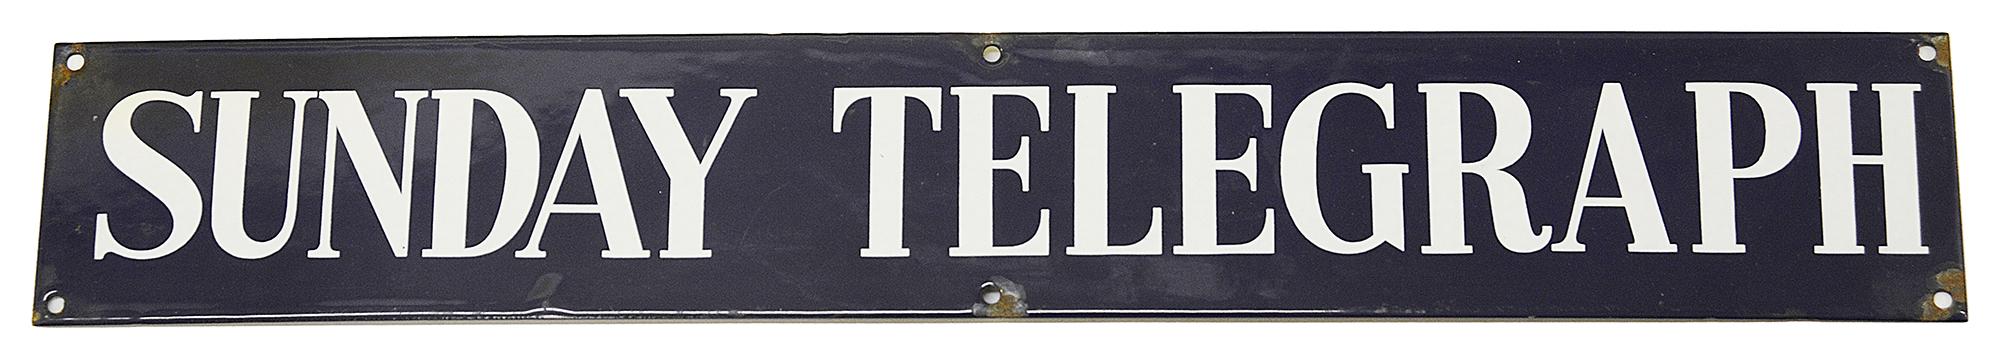 A Sunday Telegraph enamel sign